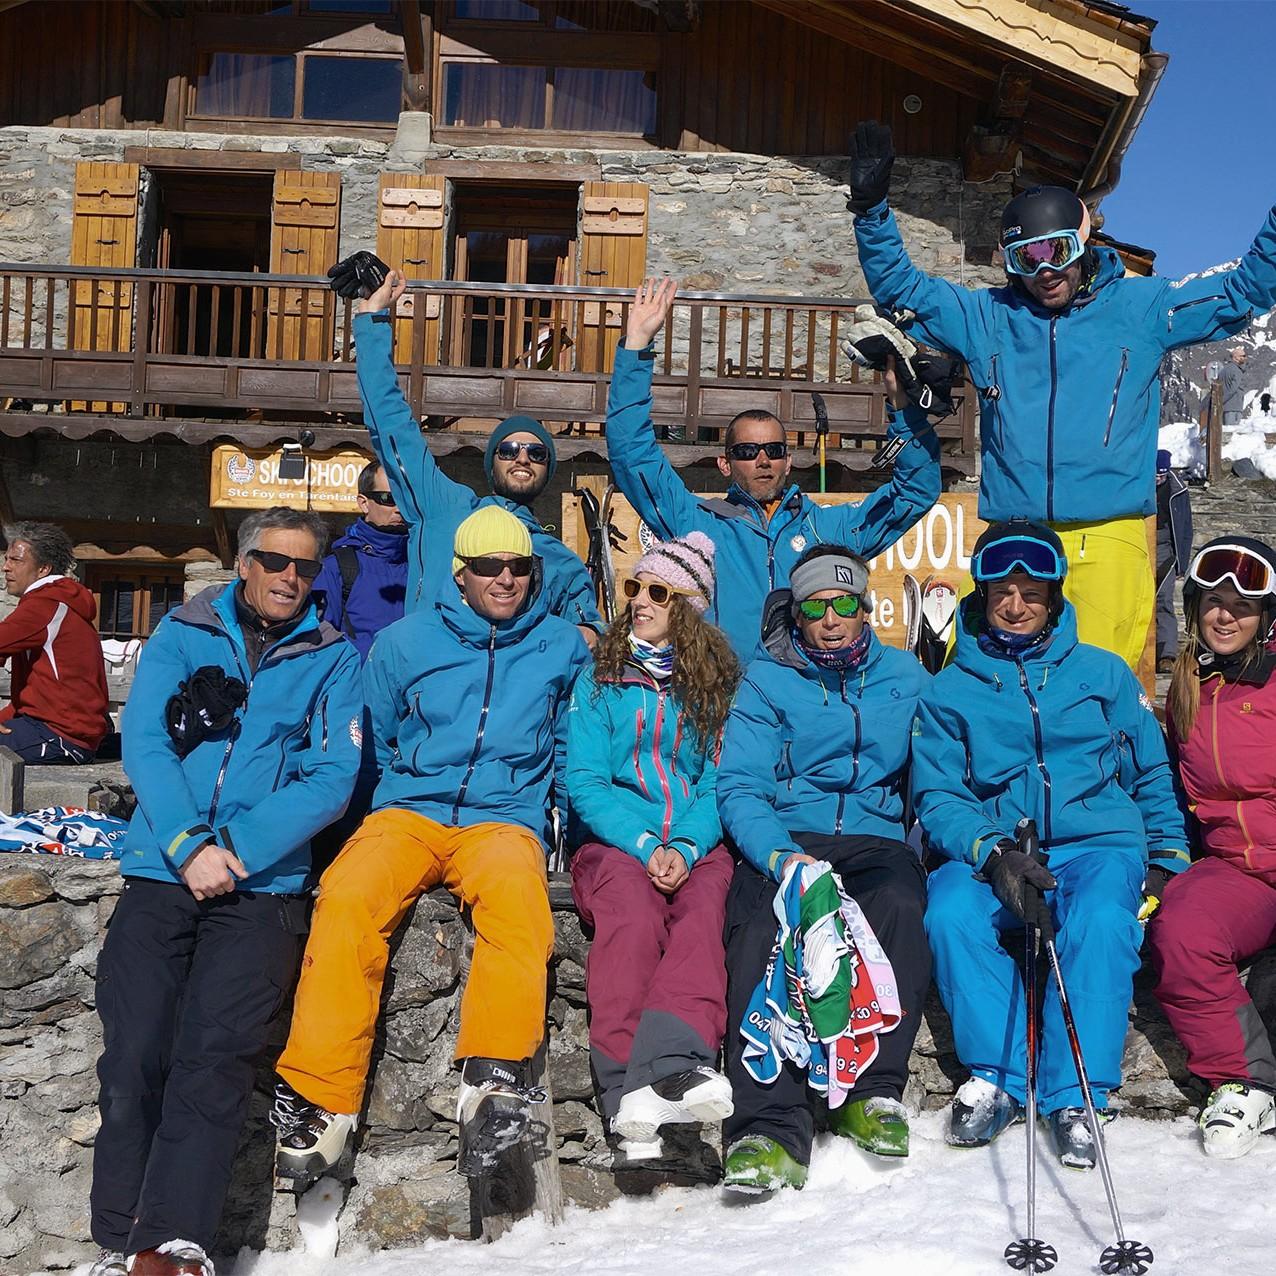 moniteurs-ski-school-snocool